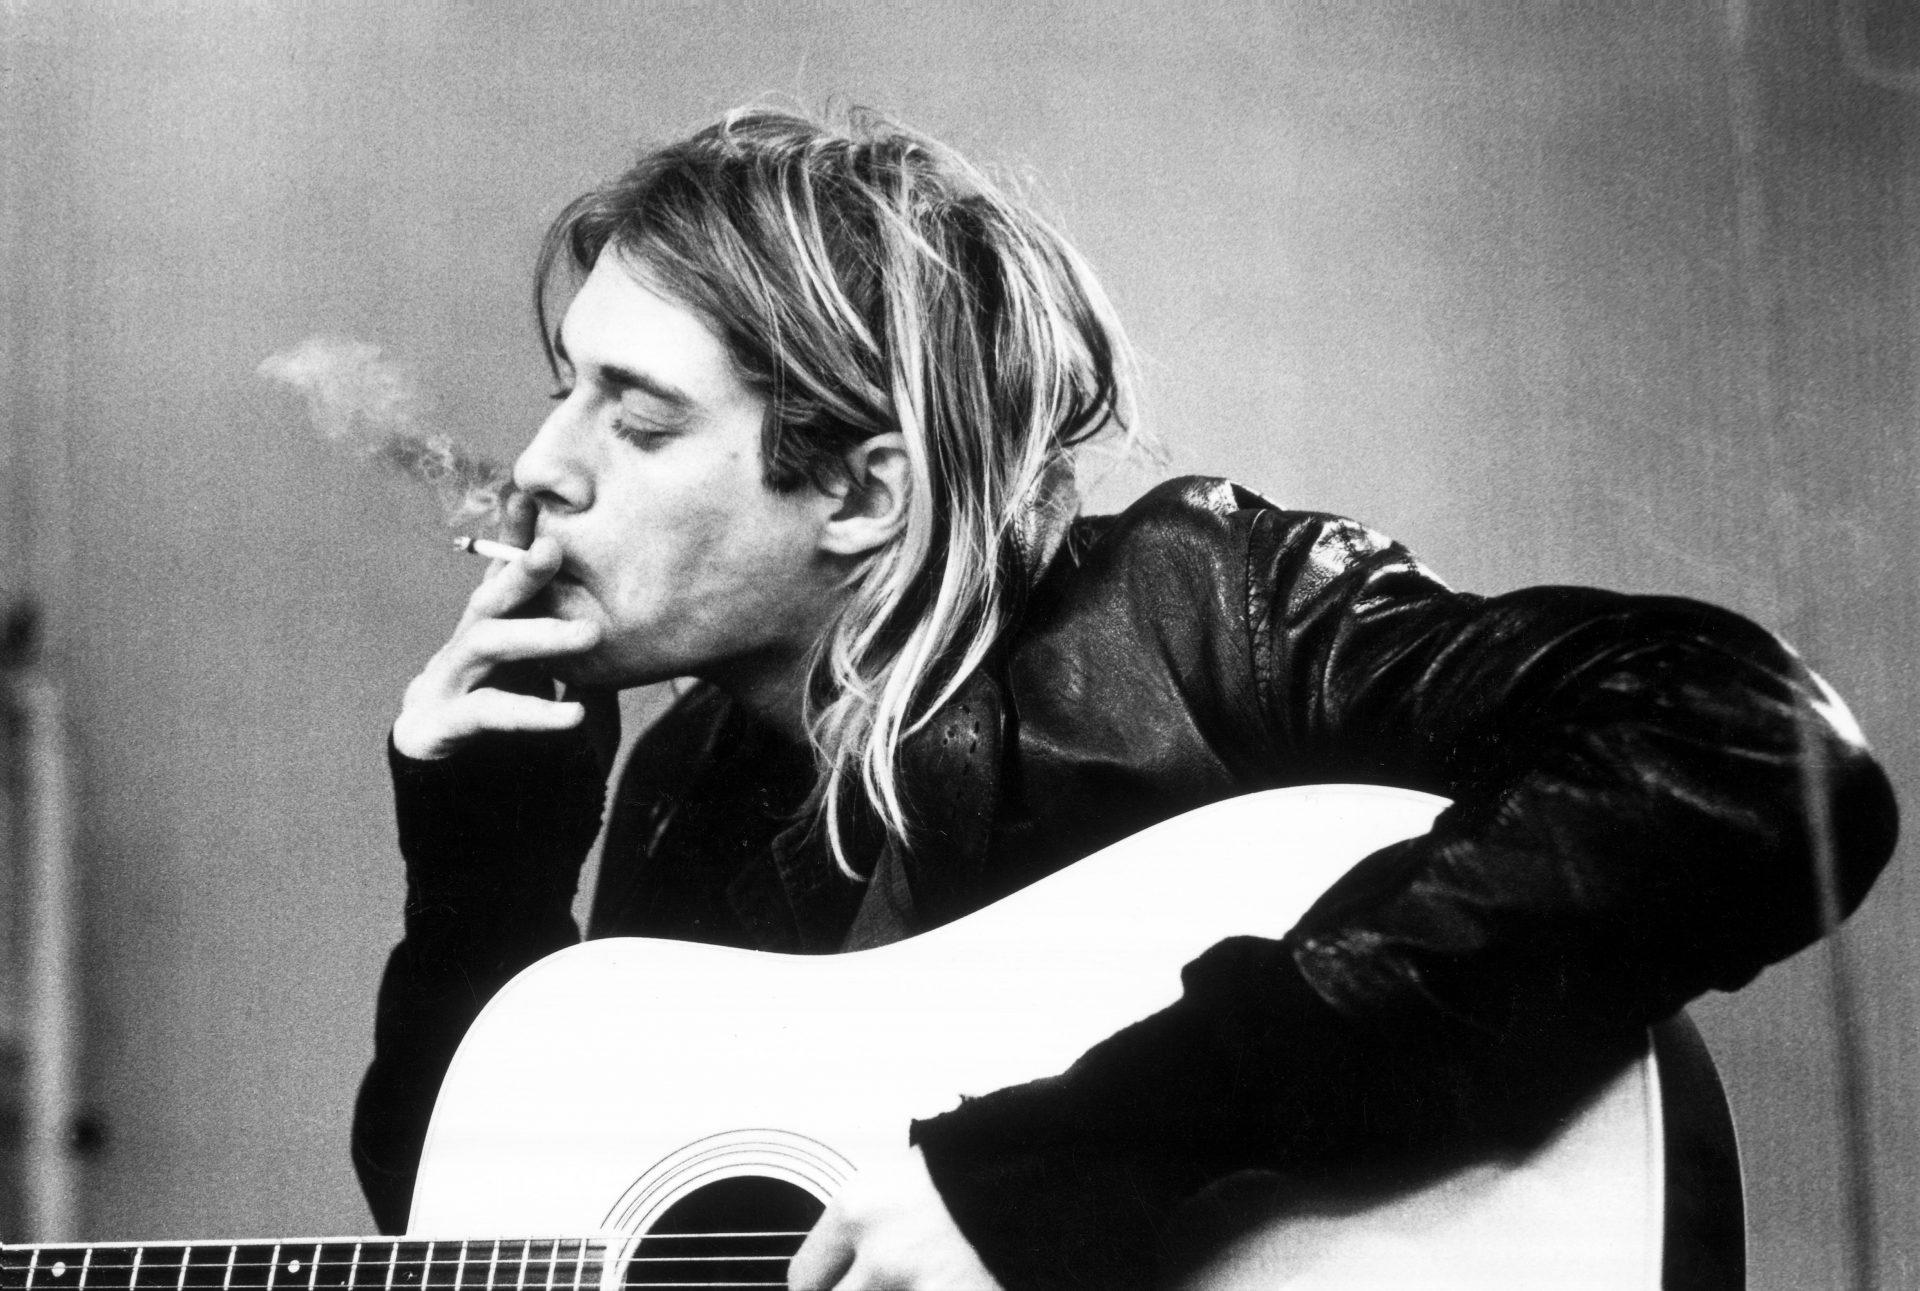 Kurt Cobain recording in Hilversum Studios smoking a cigarette. Photo: Michel Linssen/Redferns.